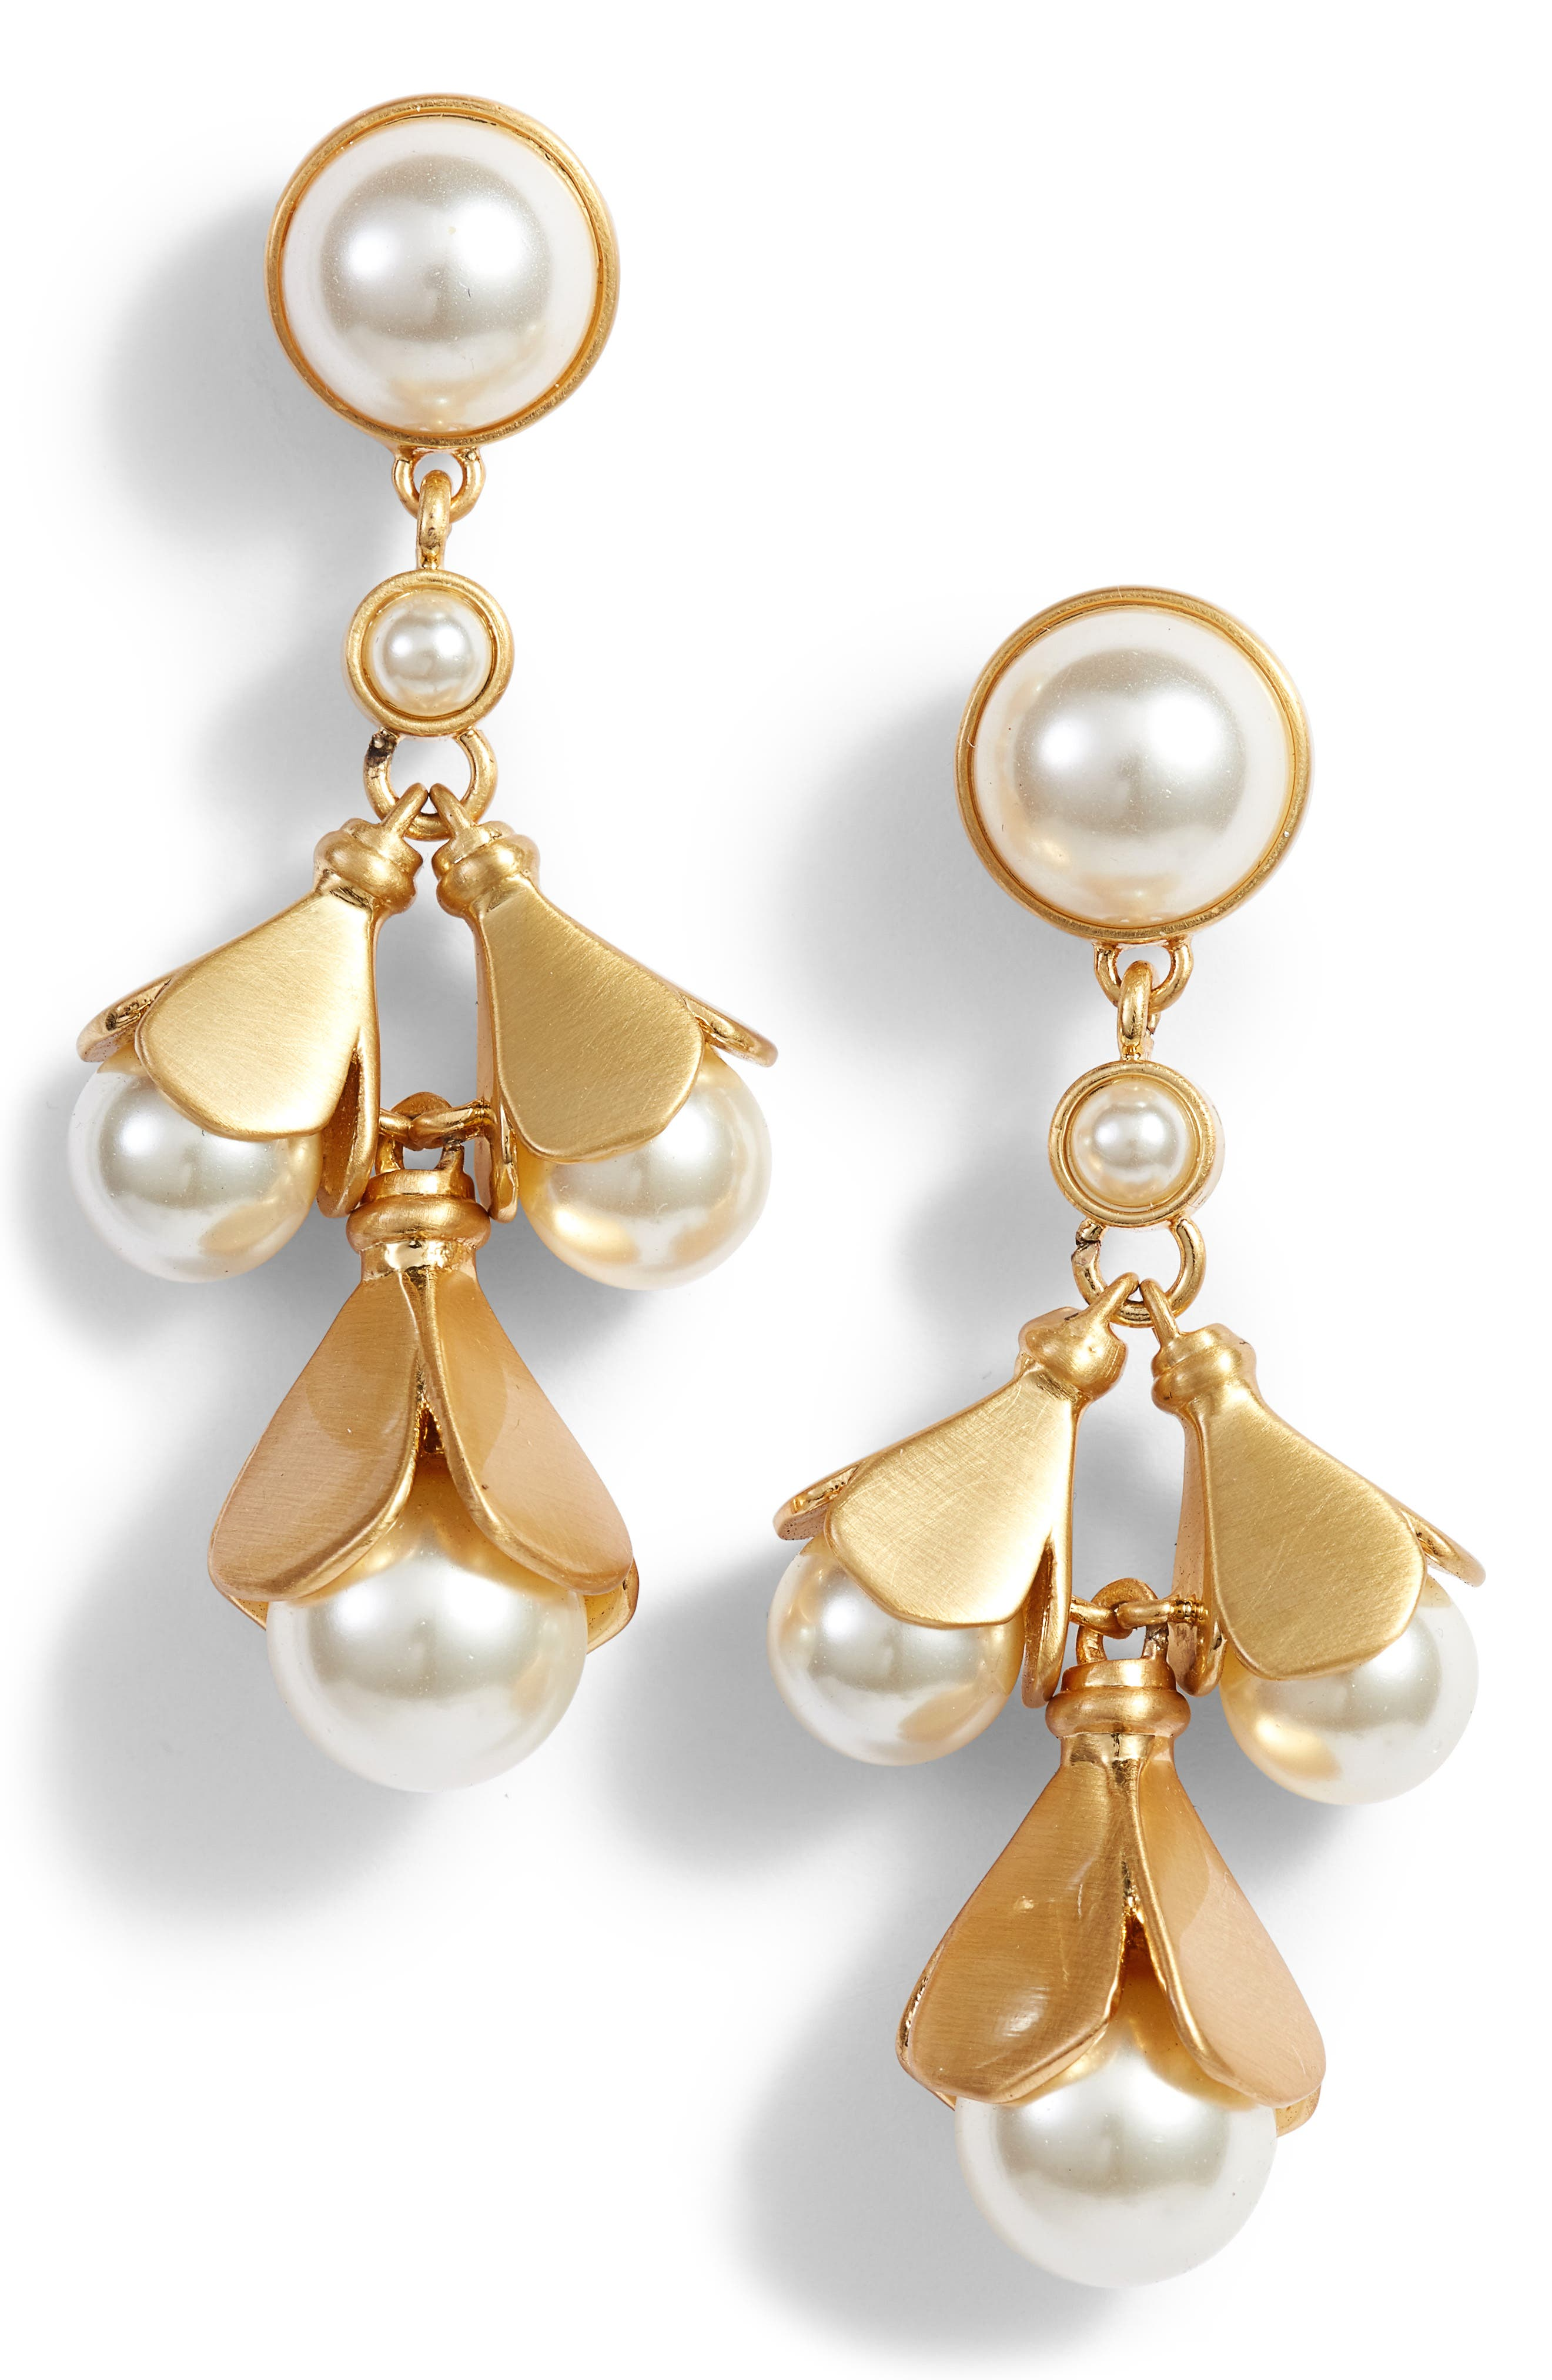 Bellflower Drop Earrings,                         Main,                         color, PEARL / BRASS